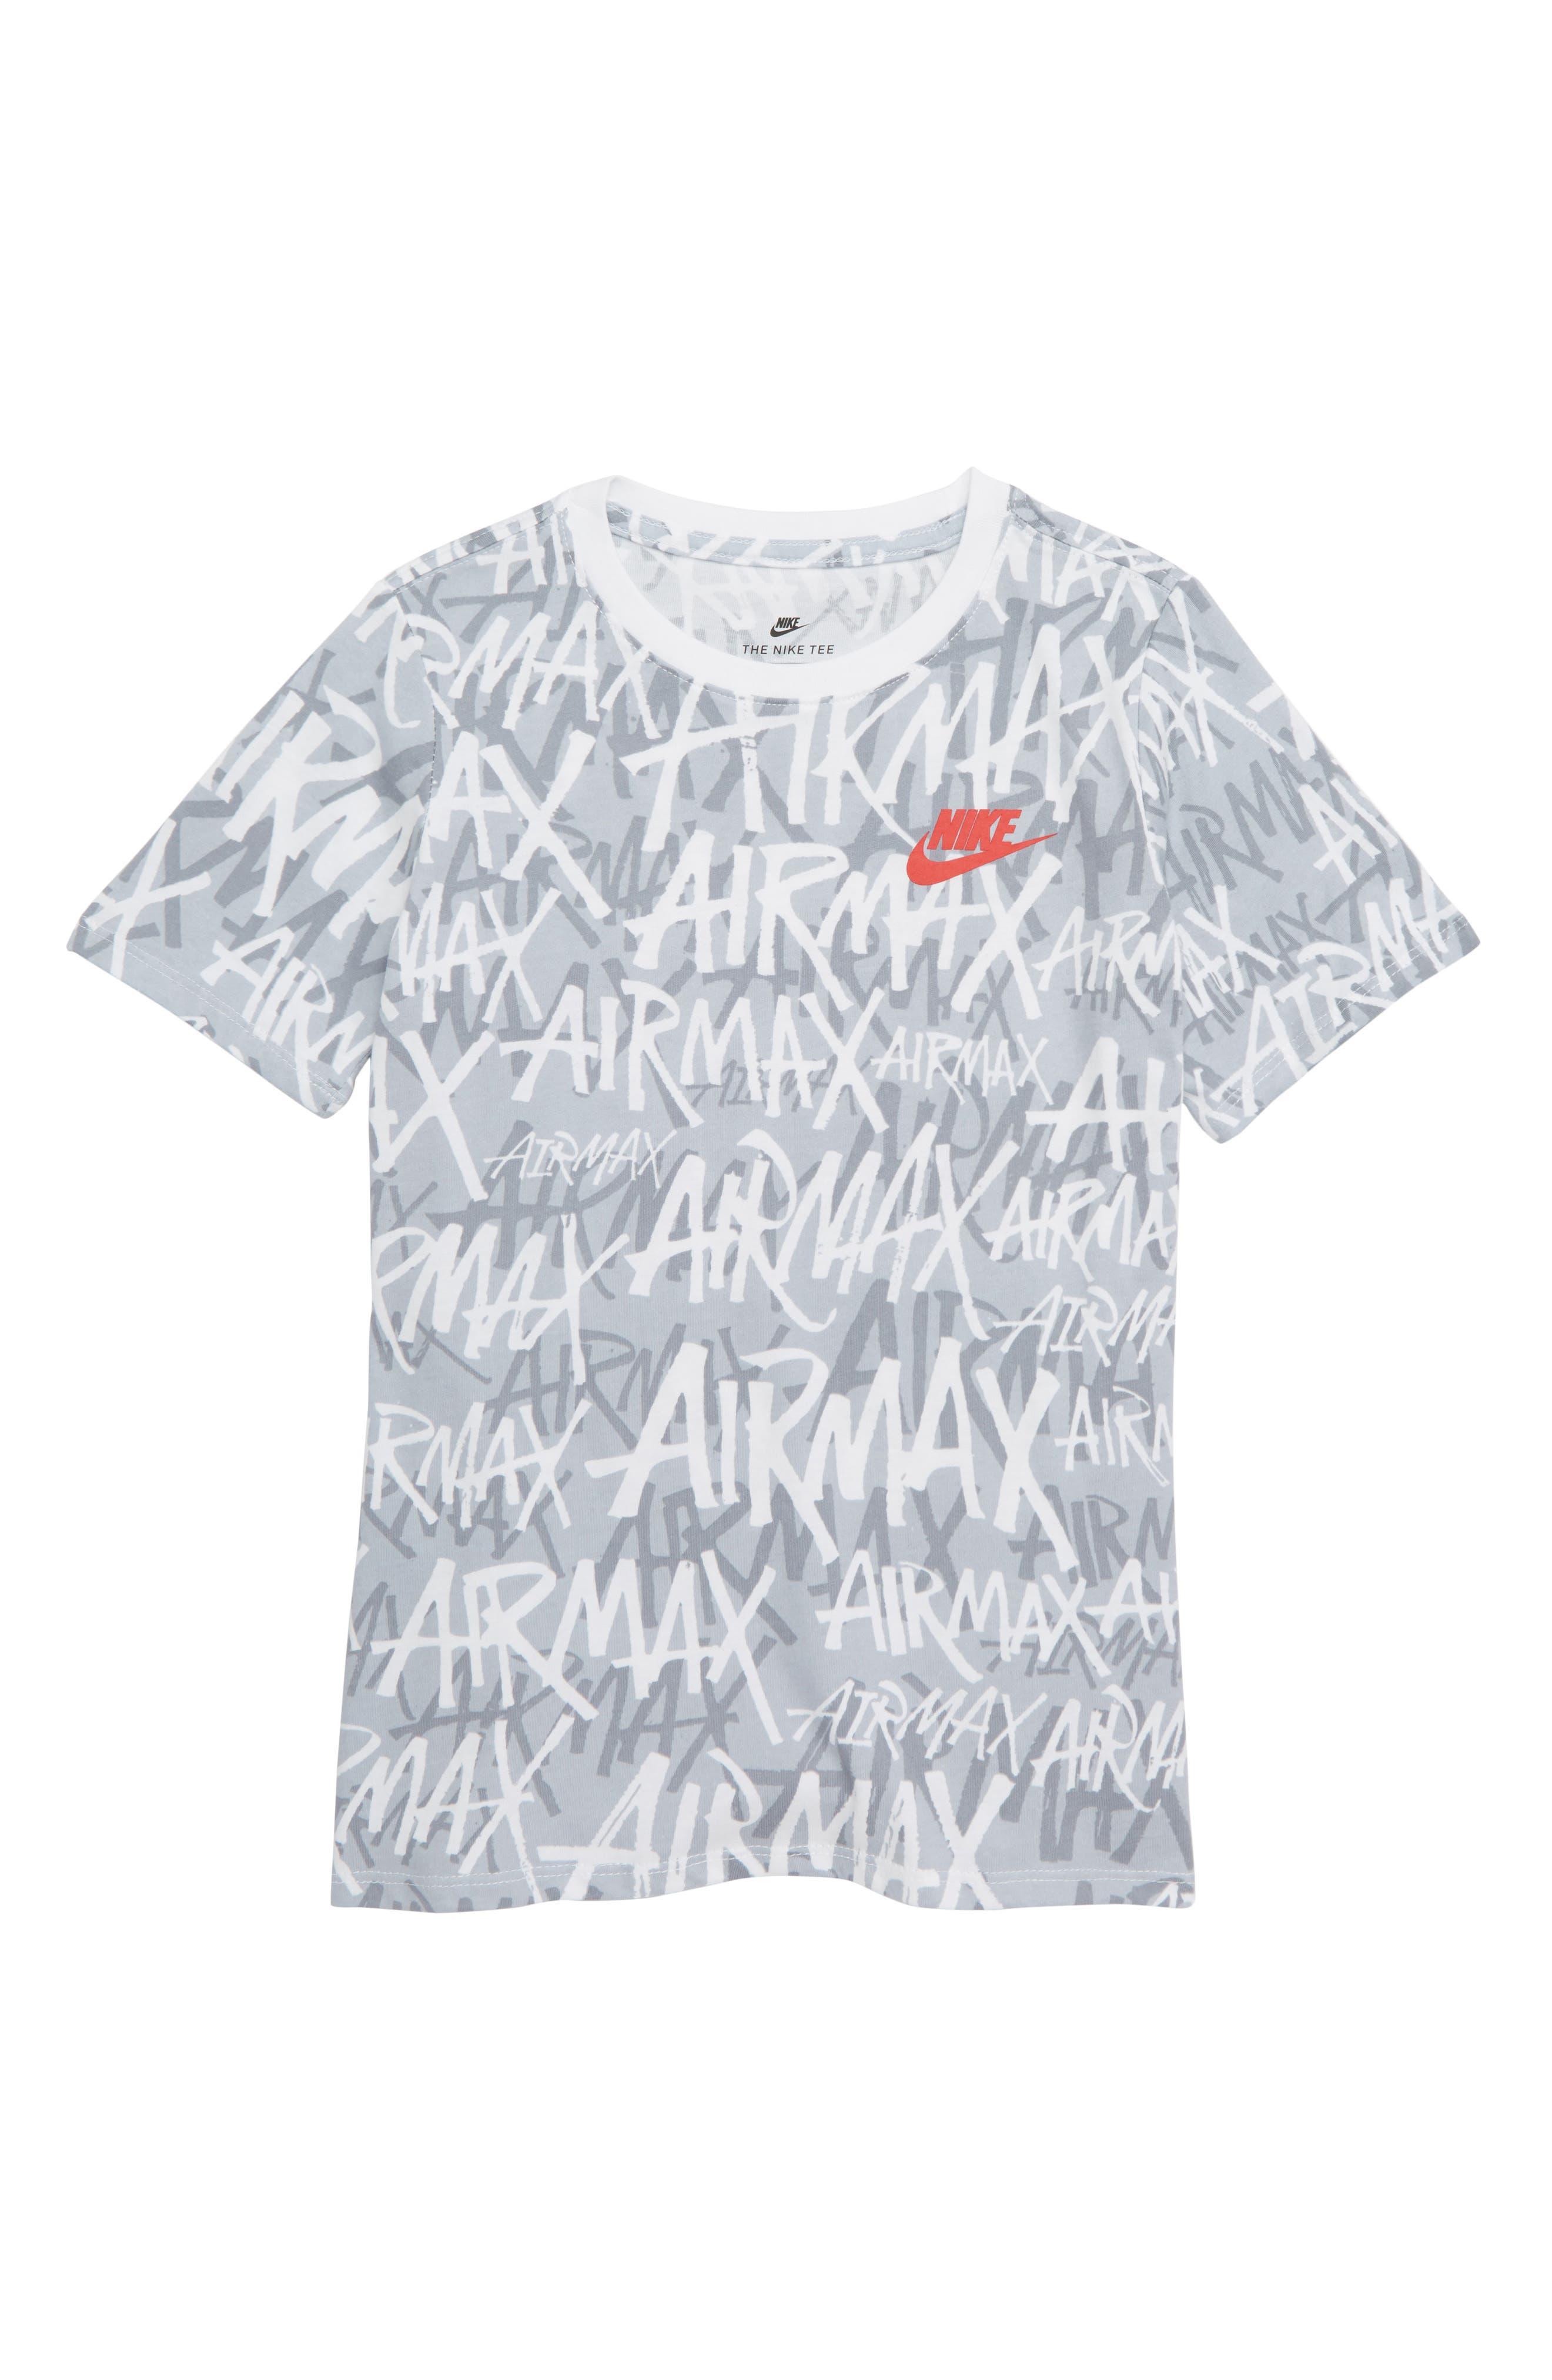 Sportswear Air Max Logo T-Shirt,                             Main thumbnail 1, color,                             WHITE/ UNIVERSITY RED